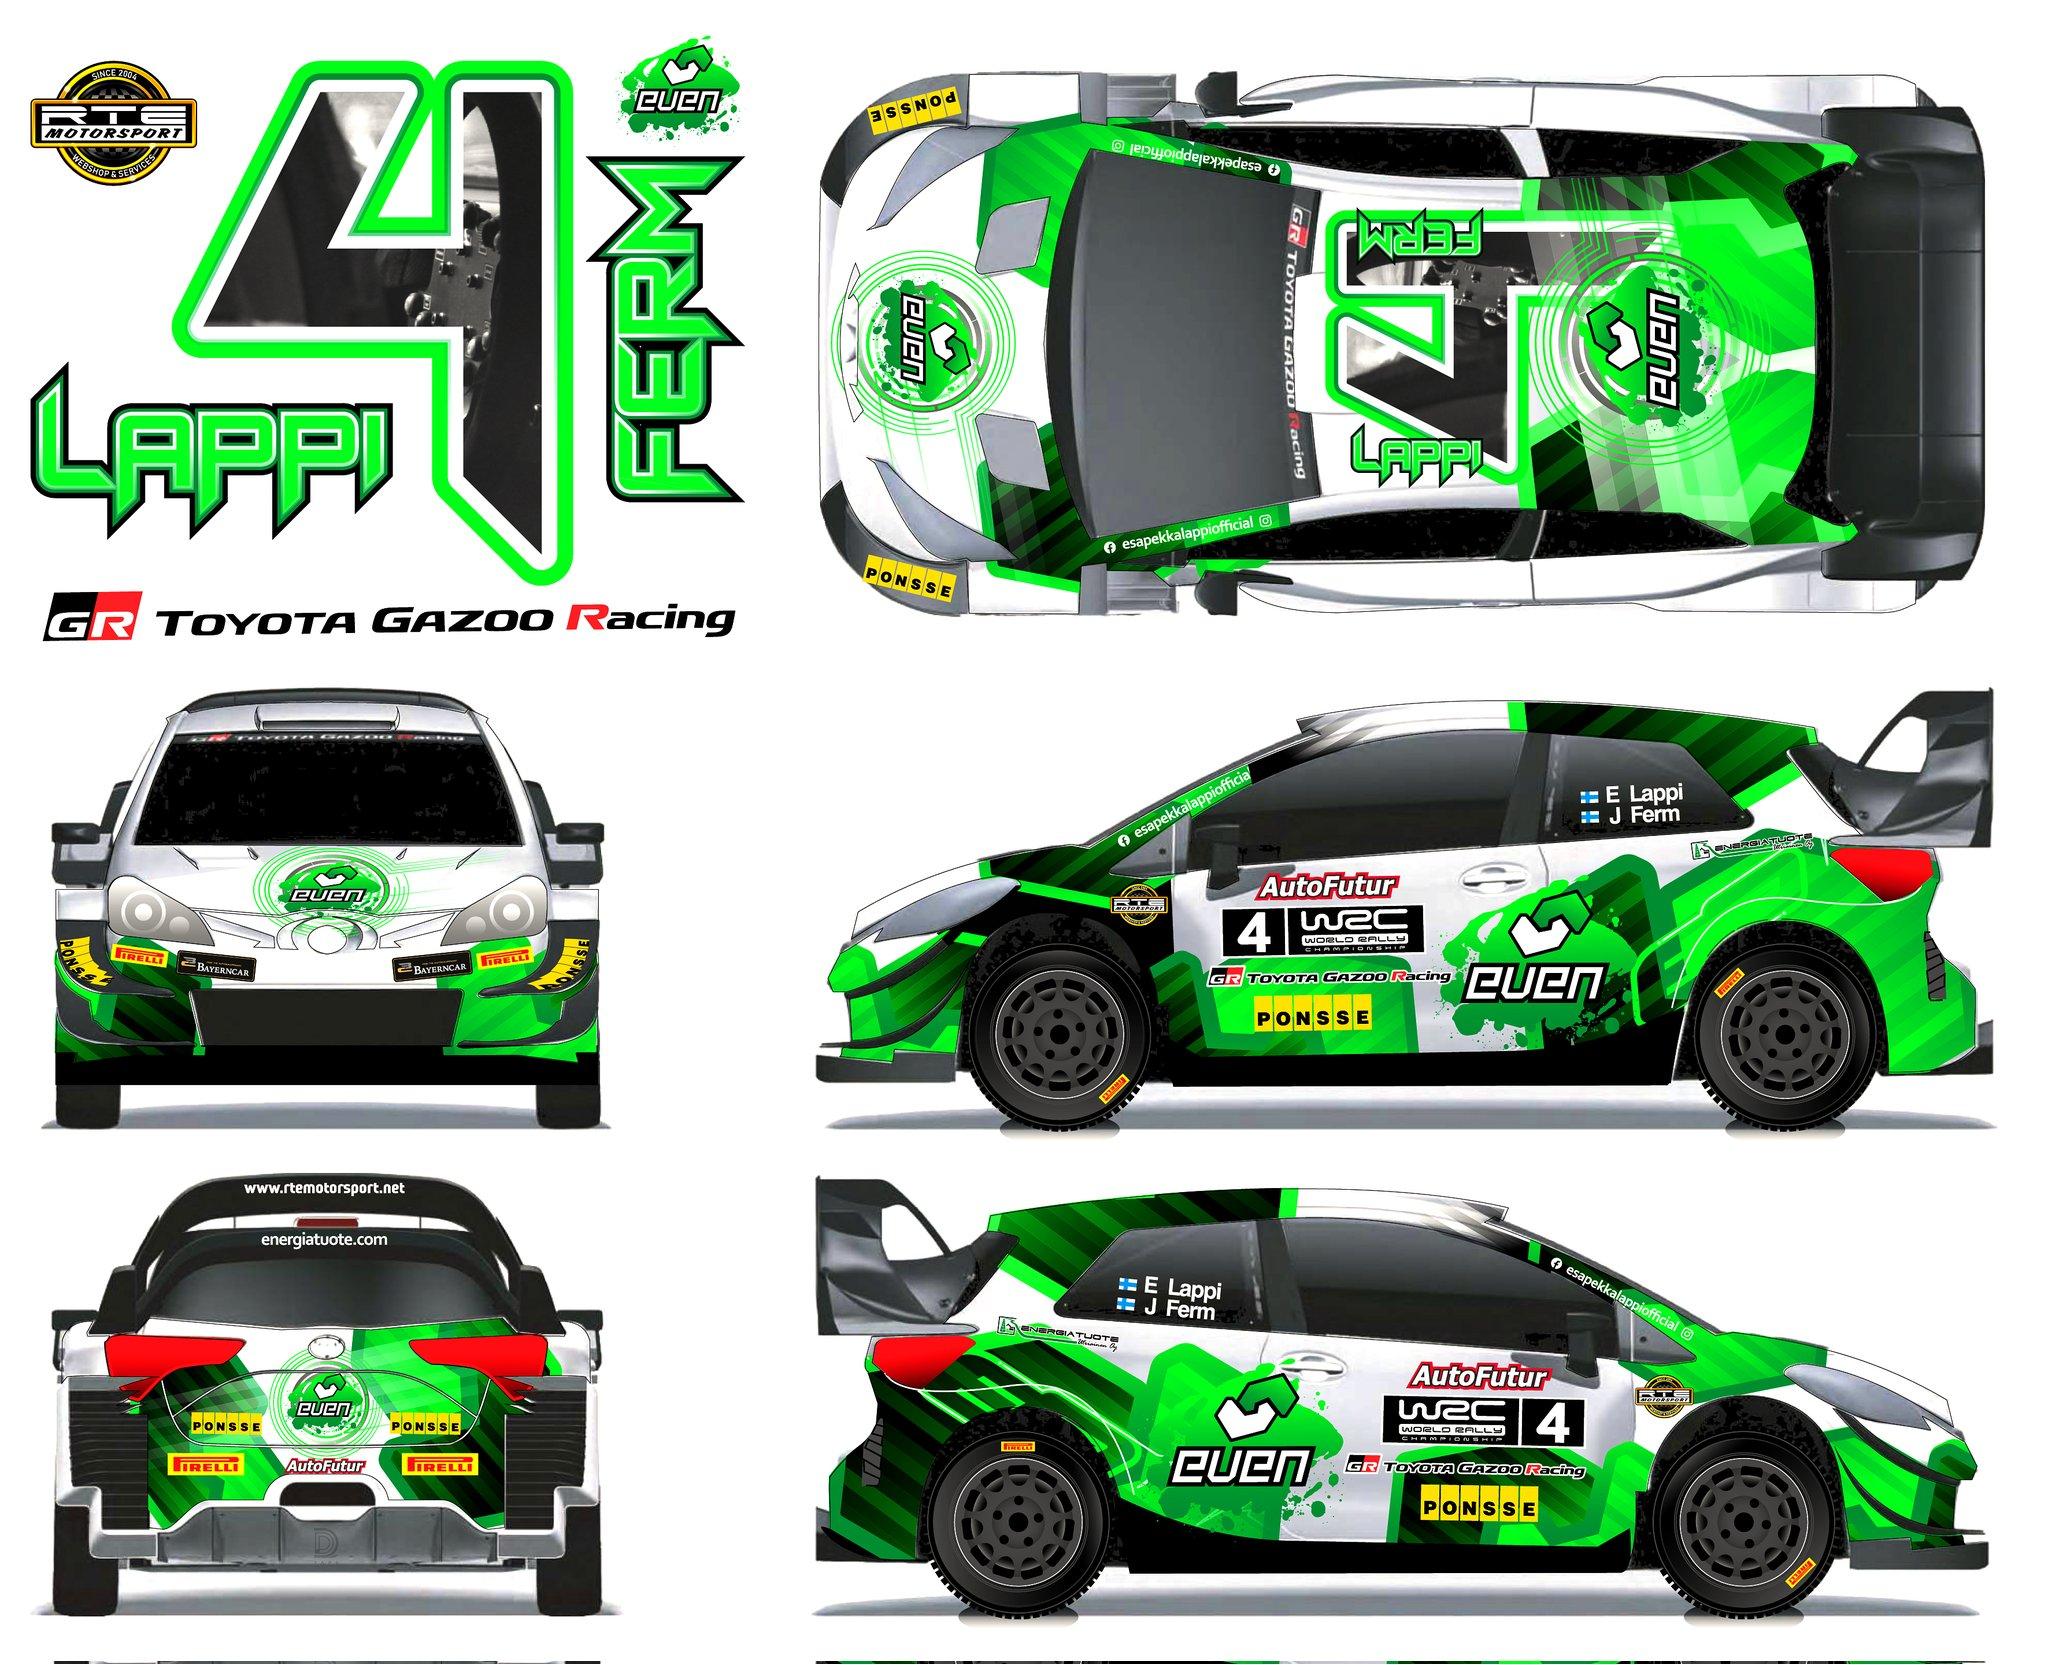 World Rally Championship: Temporada 2021  - Página 36 E_gVA0vXsAIZEim?format=jpg&name=large